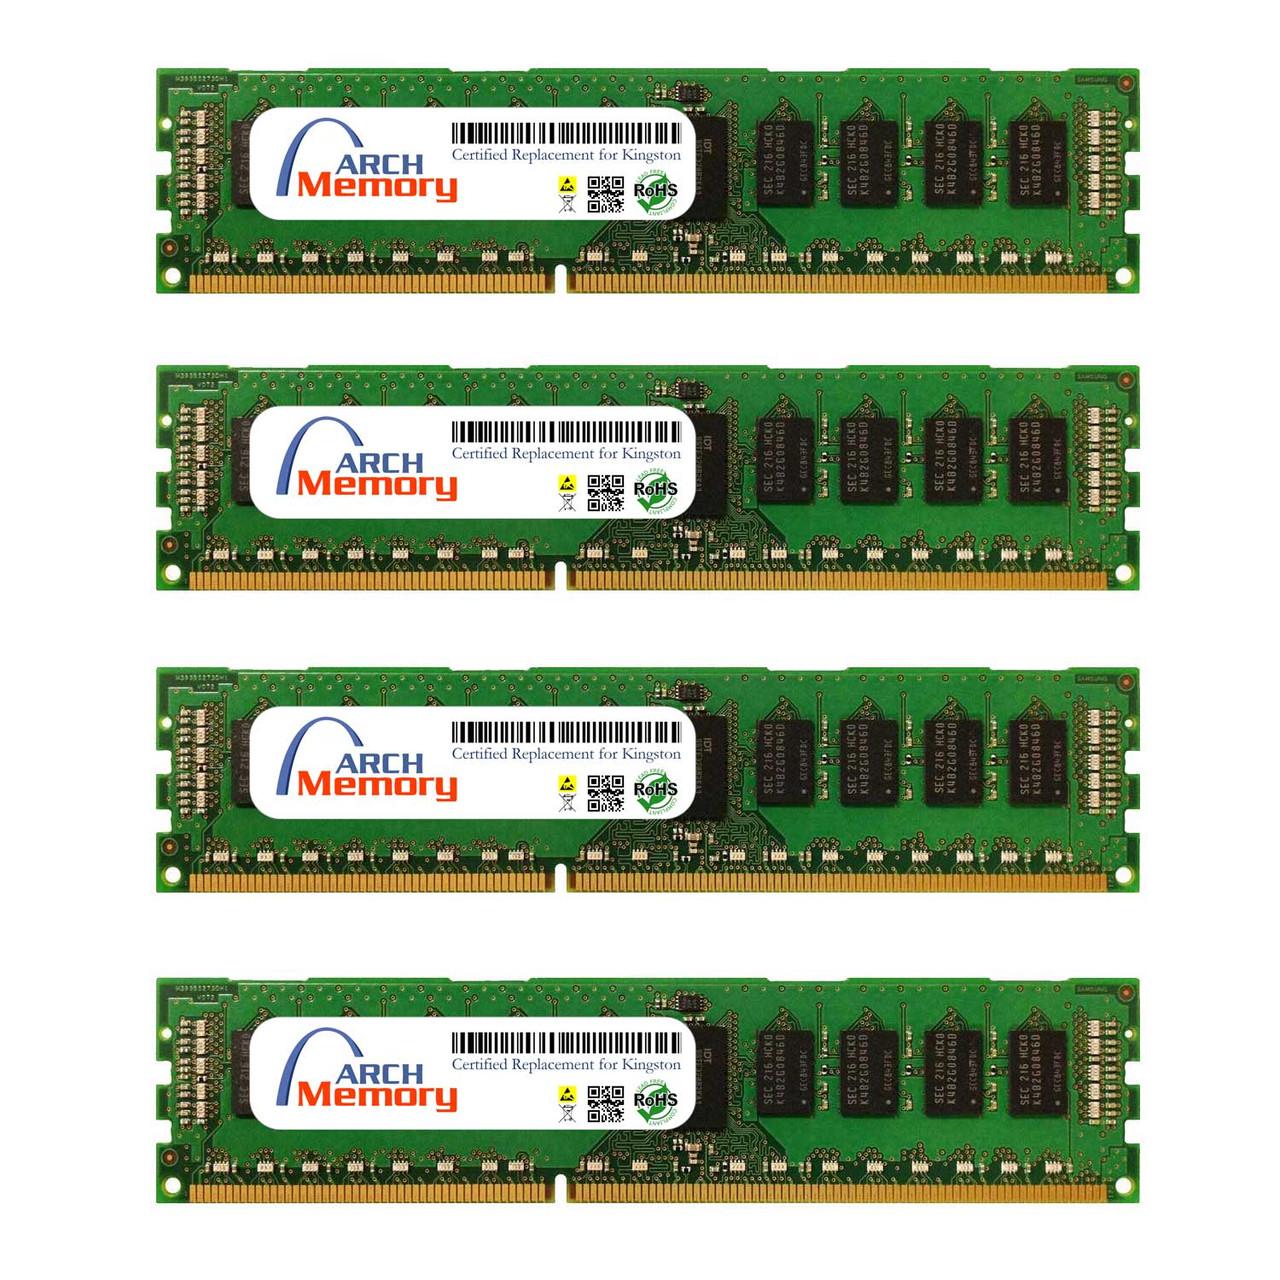 8GB KTH-PL316EK4/32G Kit (4 x 8 GB) DDR3 1600MHz 240-Pin ECC UDIMM RAM | Kingston Replacement Memory